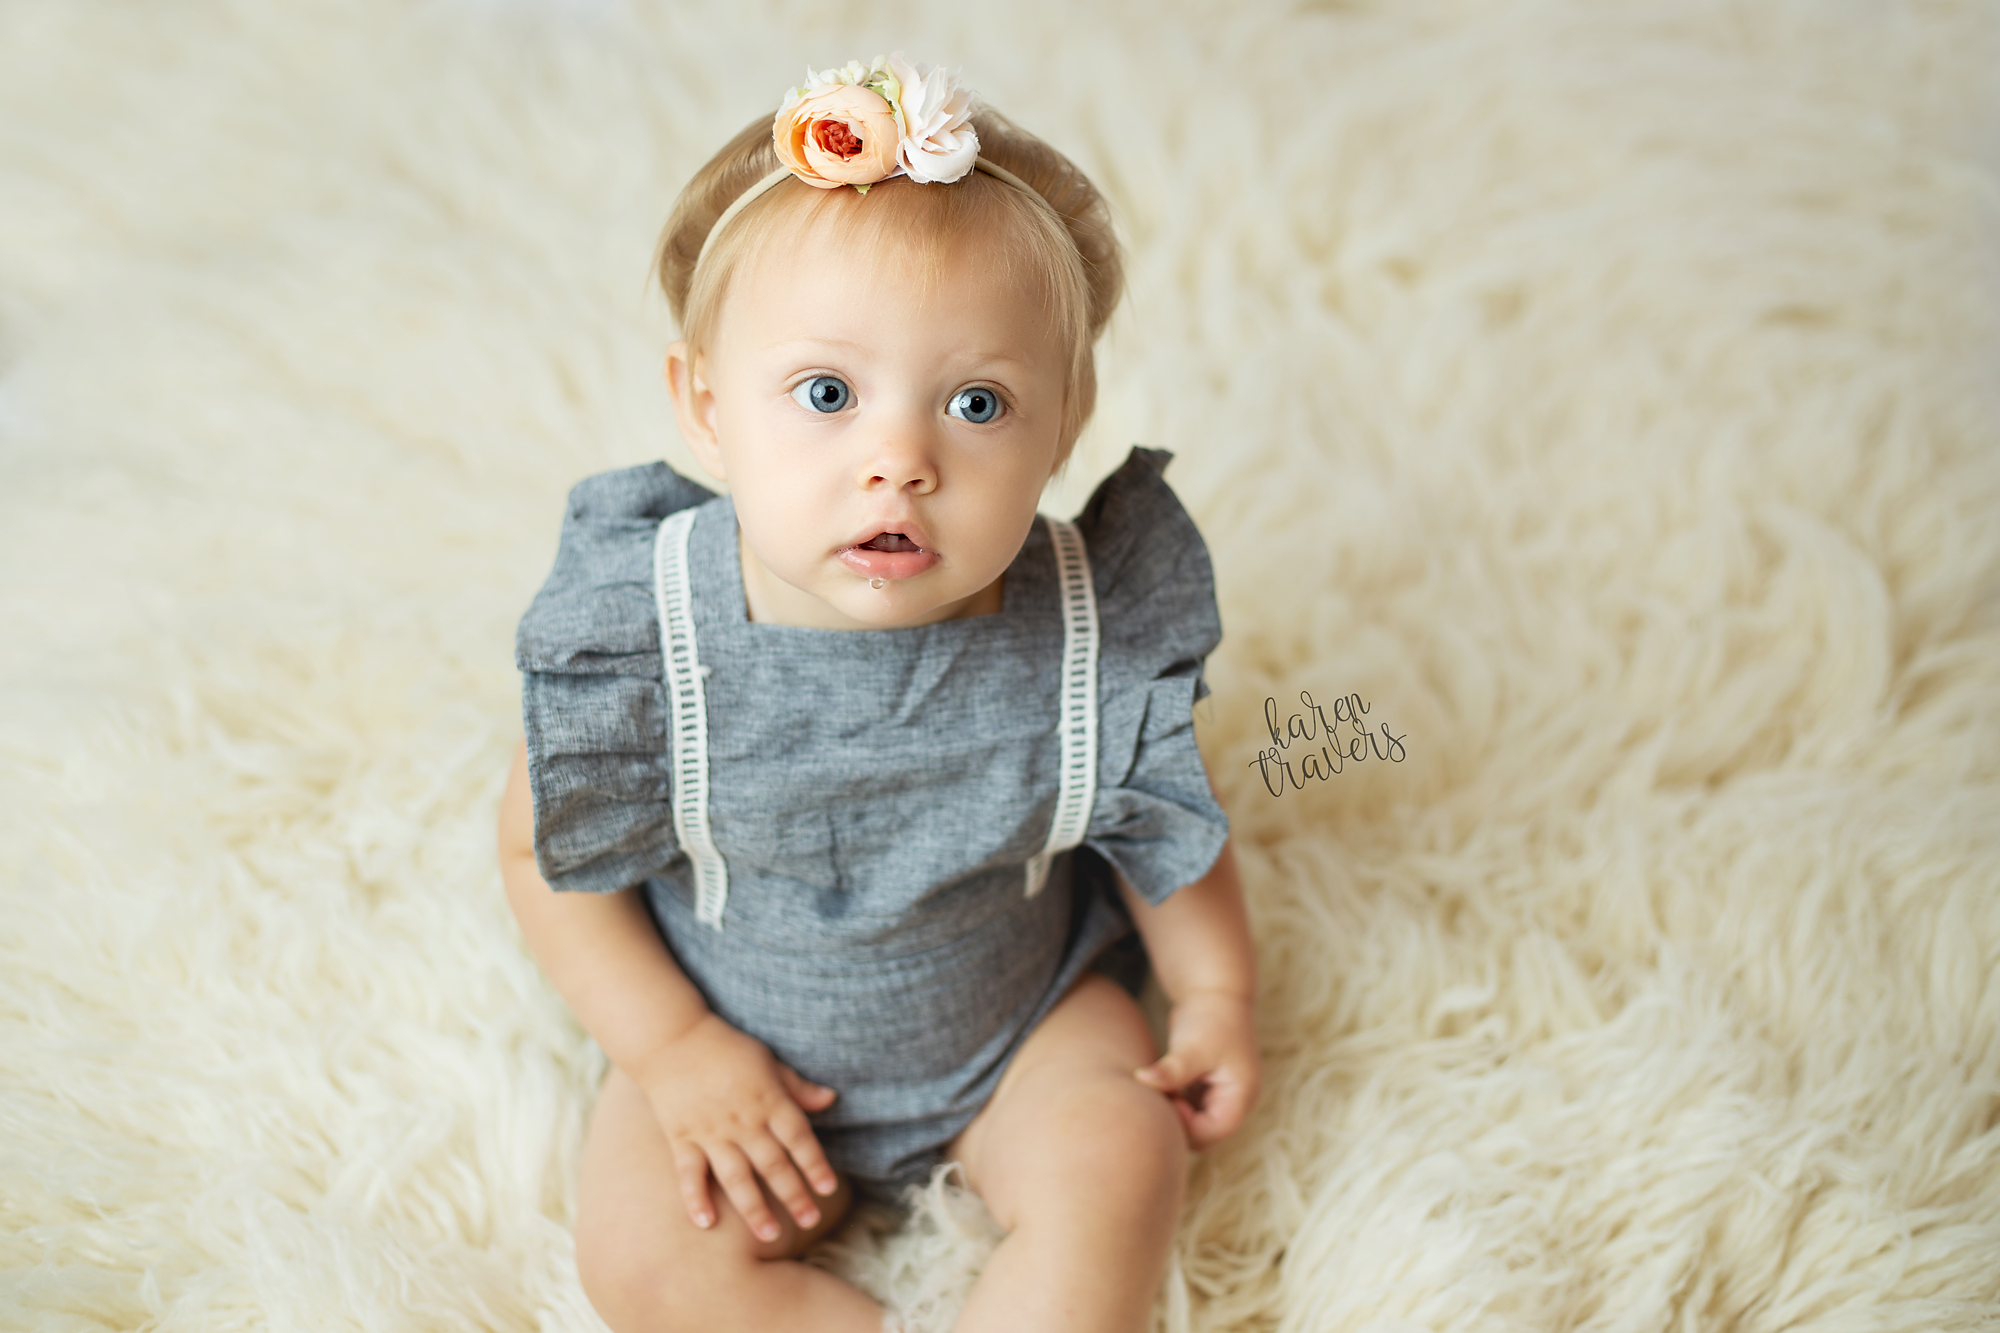 anchorage-newborn-photographer-5.png